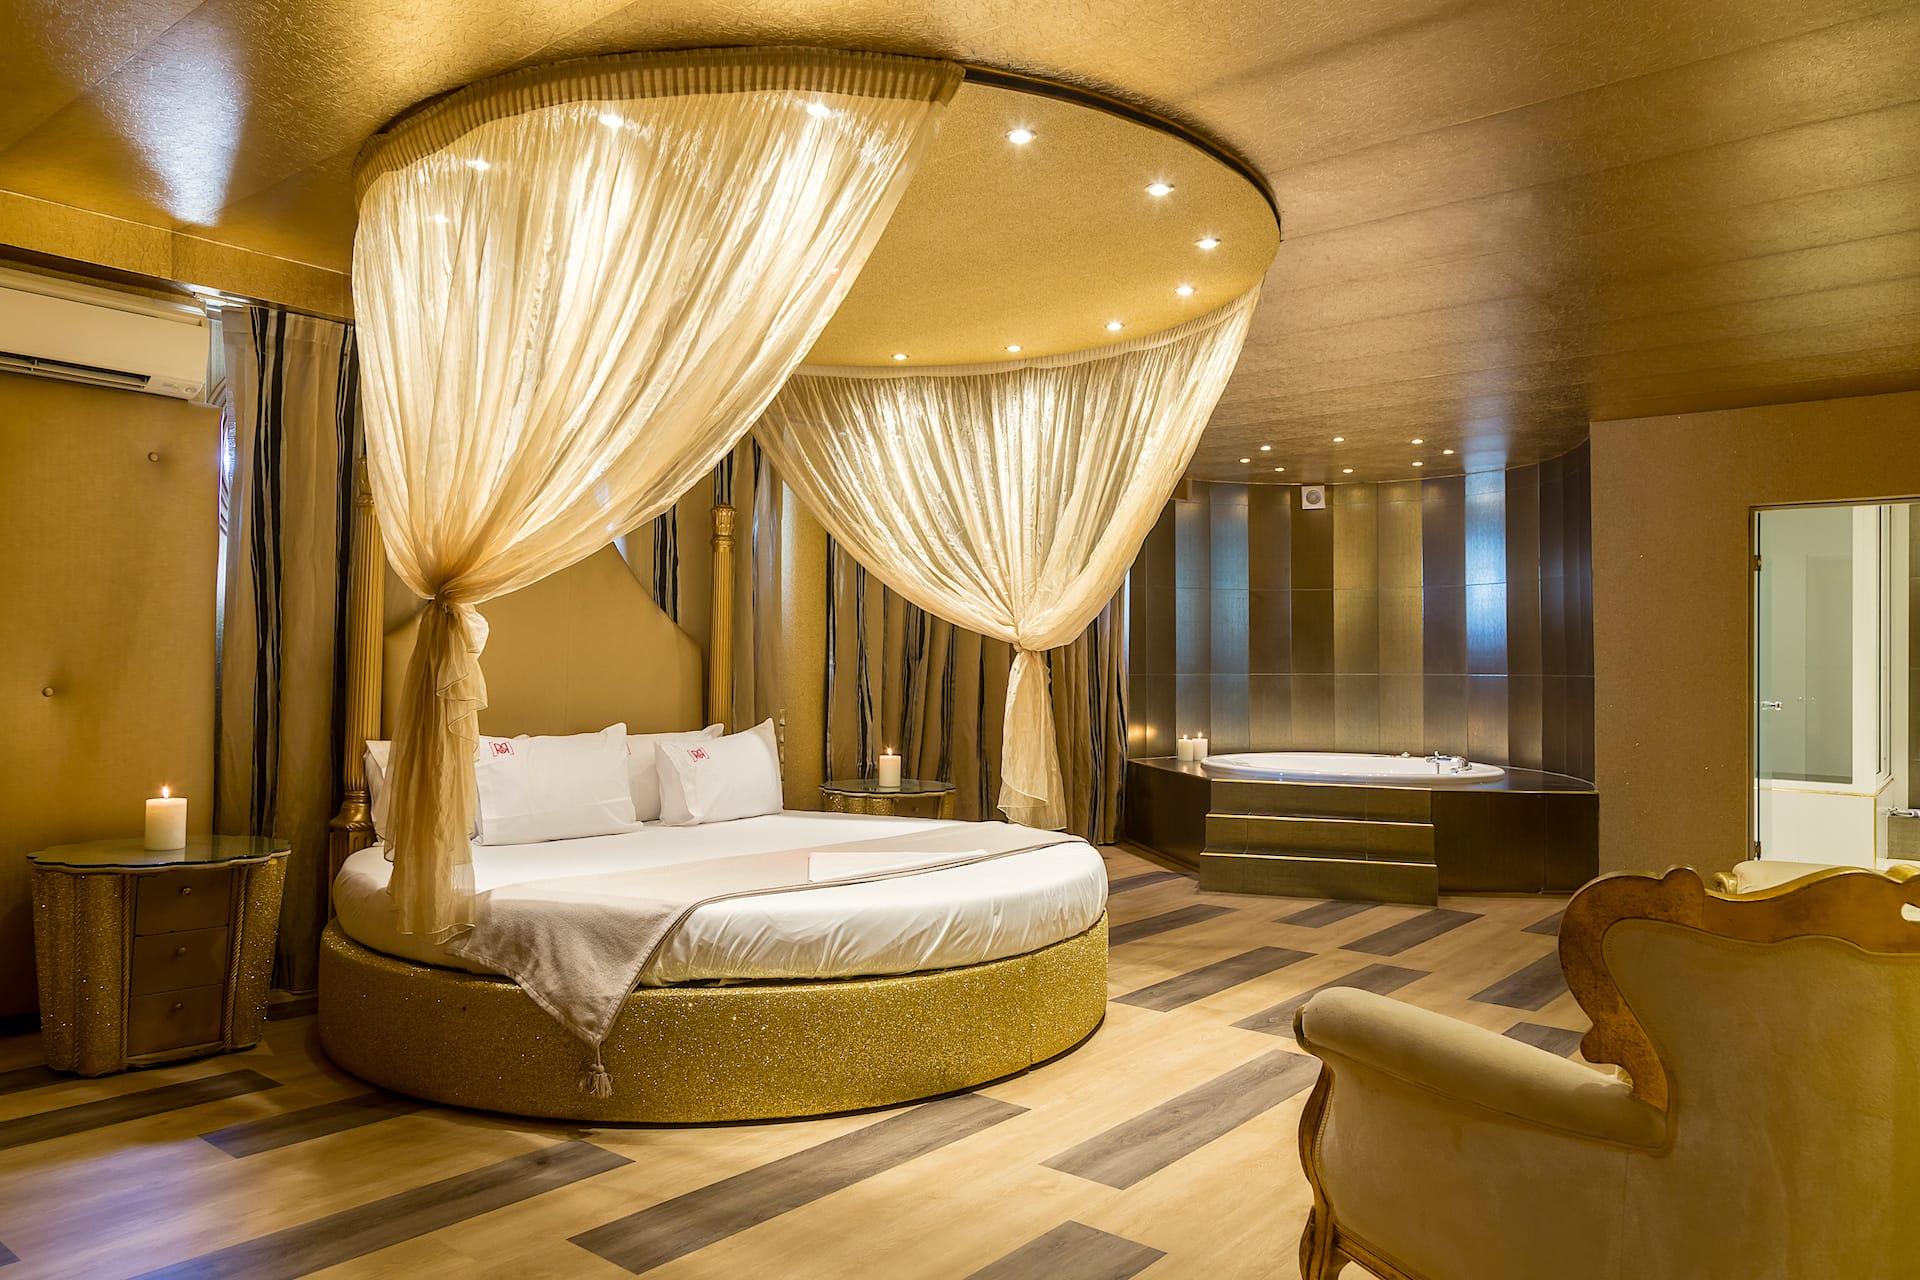 golden-suite-cover-17-40